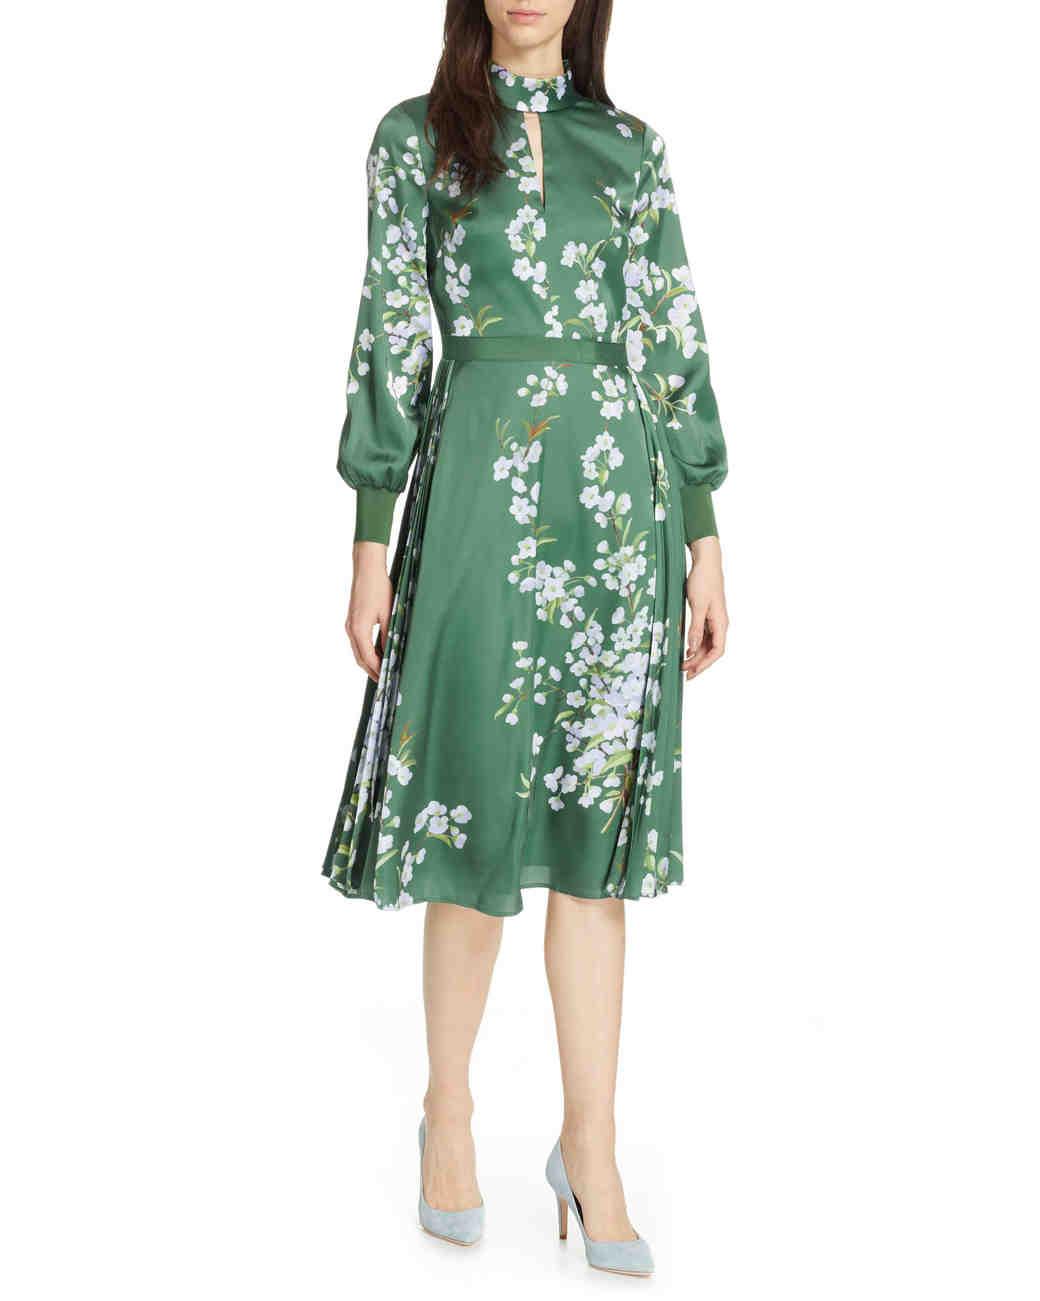 Green floral frock satin A-Line midi dress